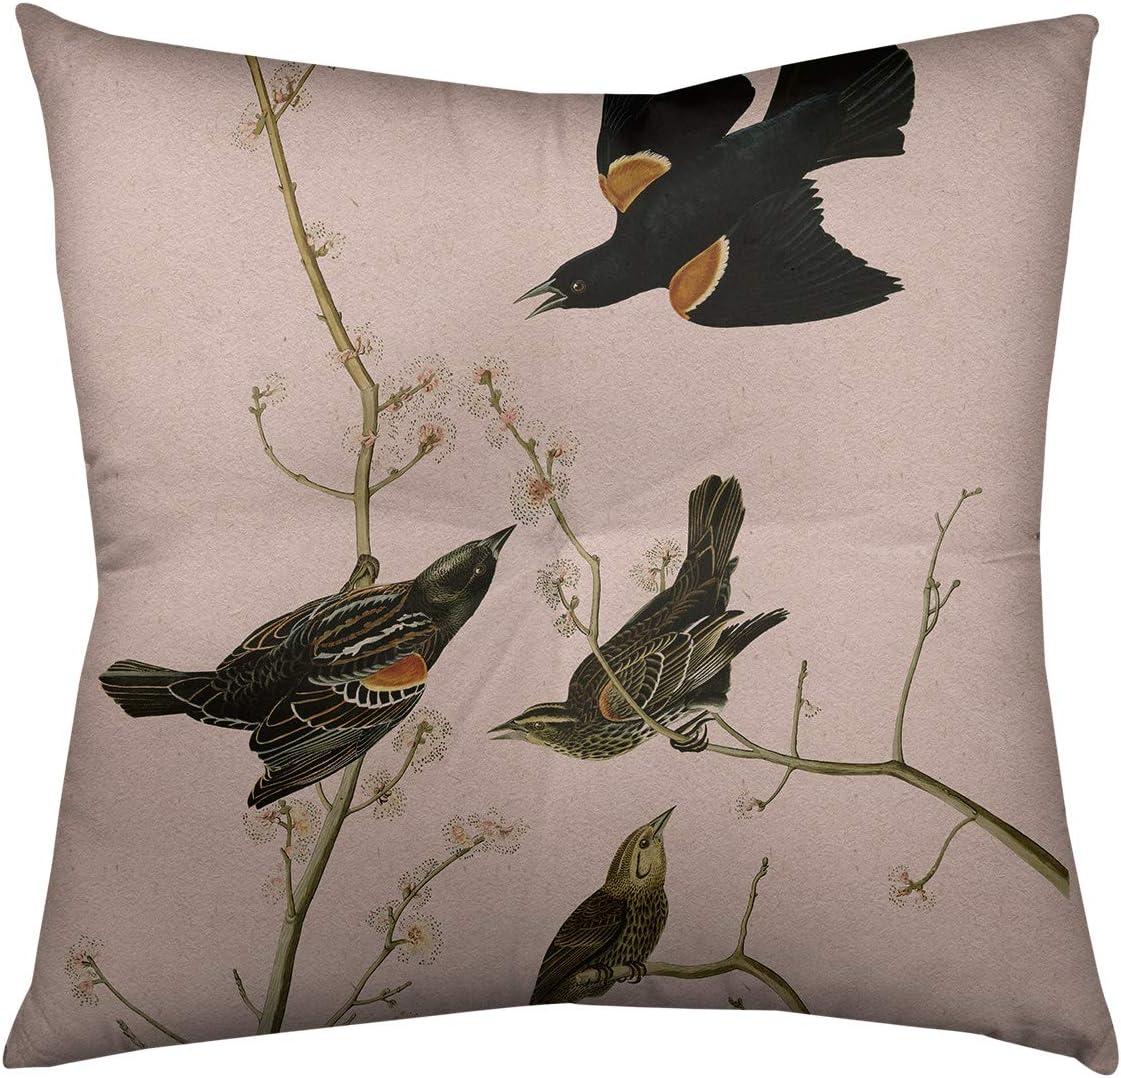 ArtVerse John James Special sale item Audubon Red-Winged in Ranking TOP7 Floor Pi Starling Pink